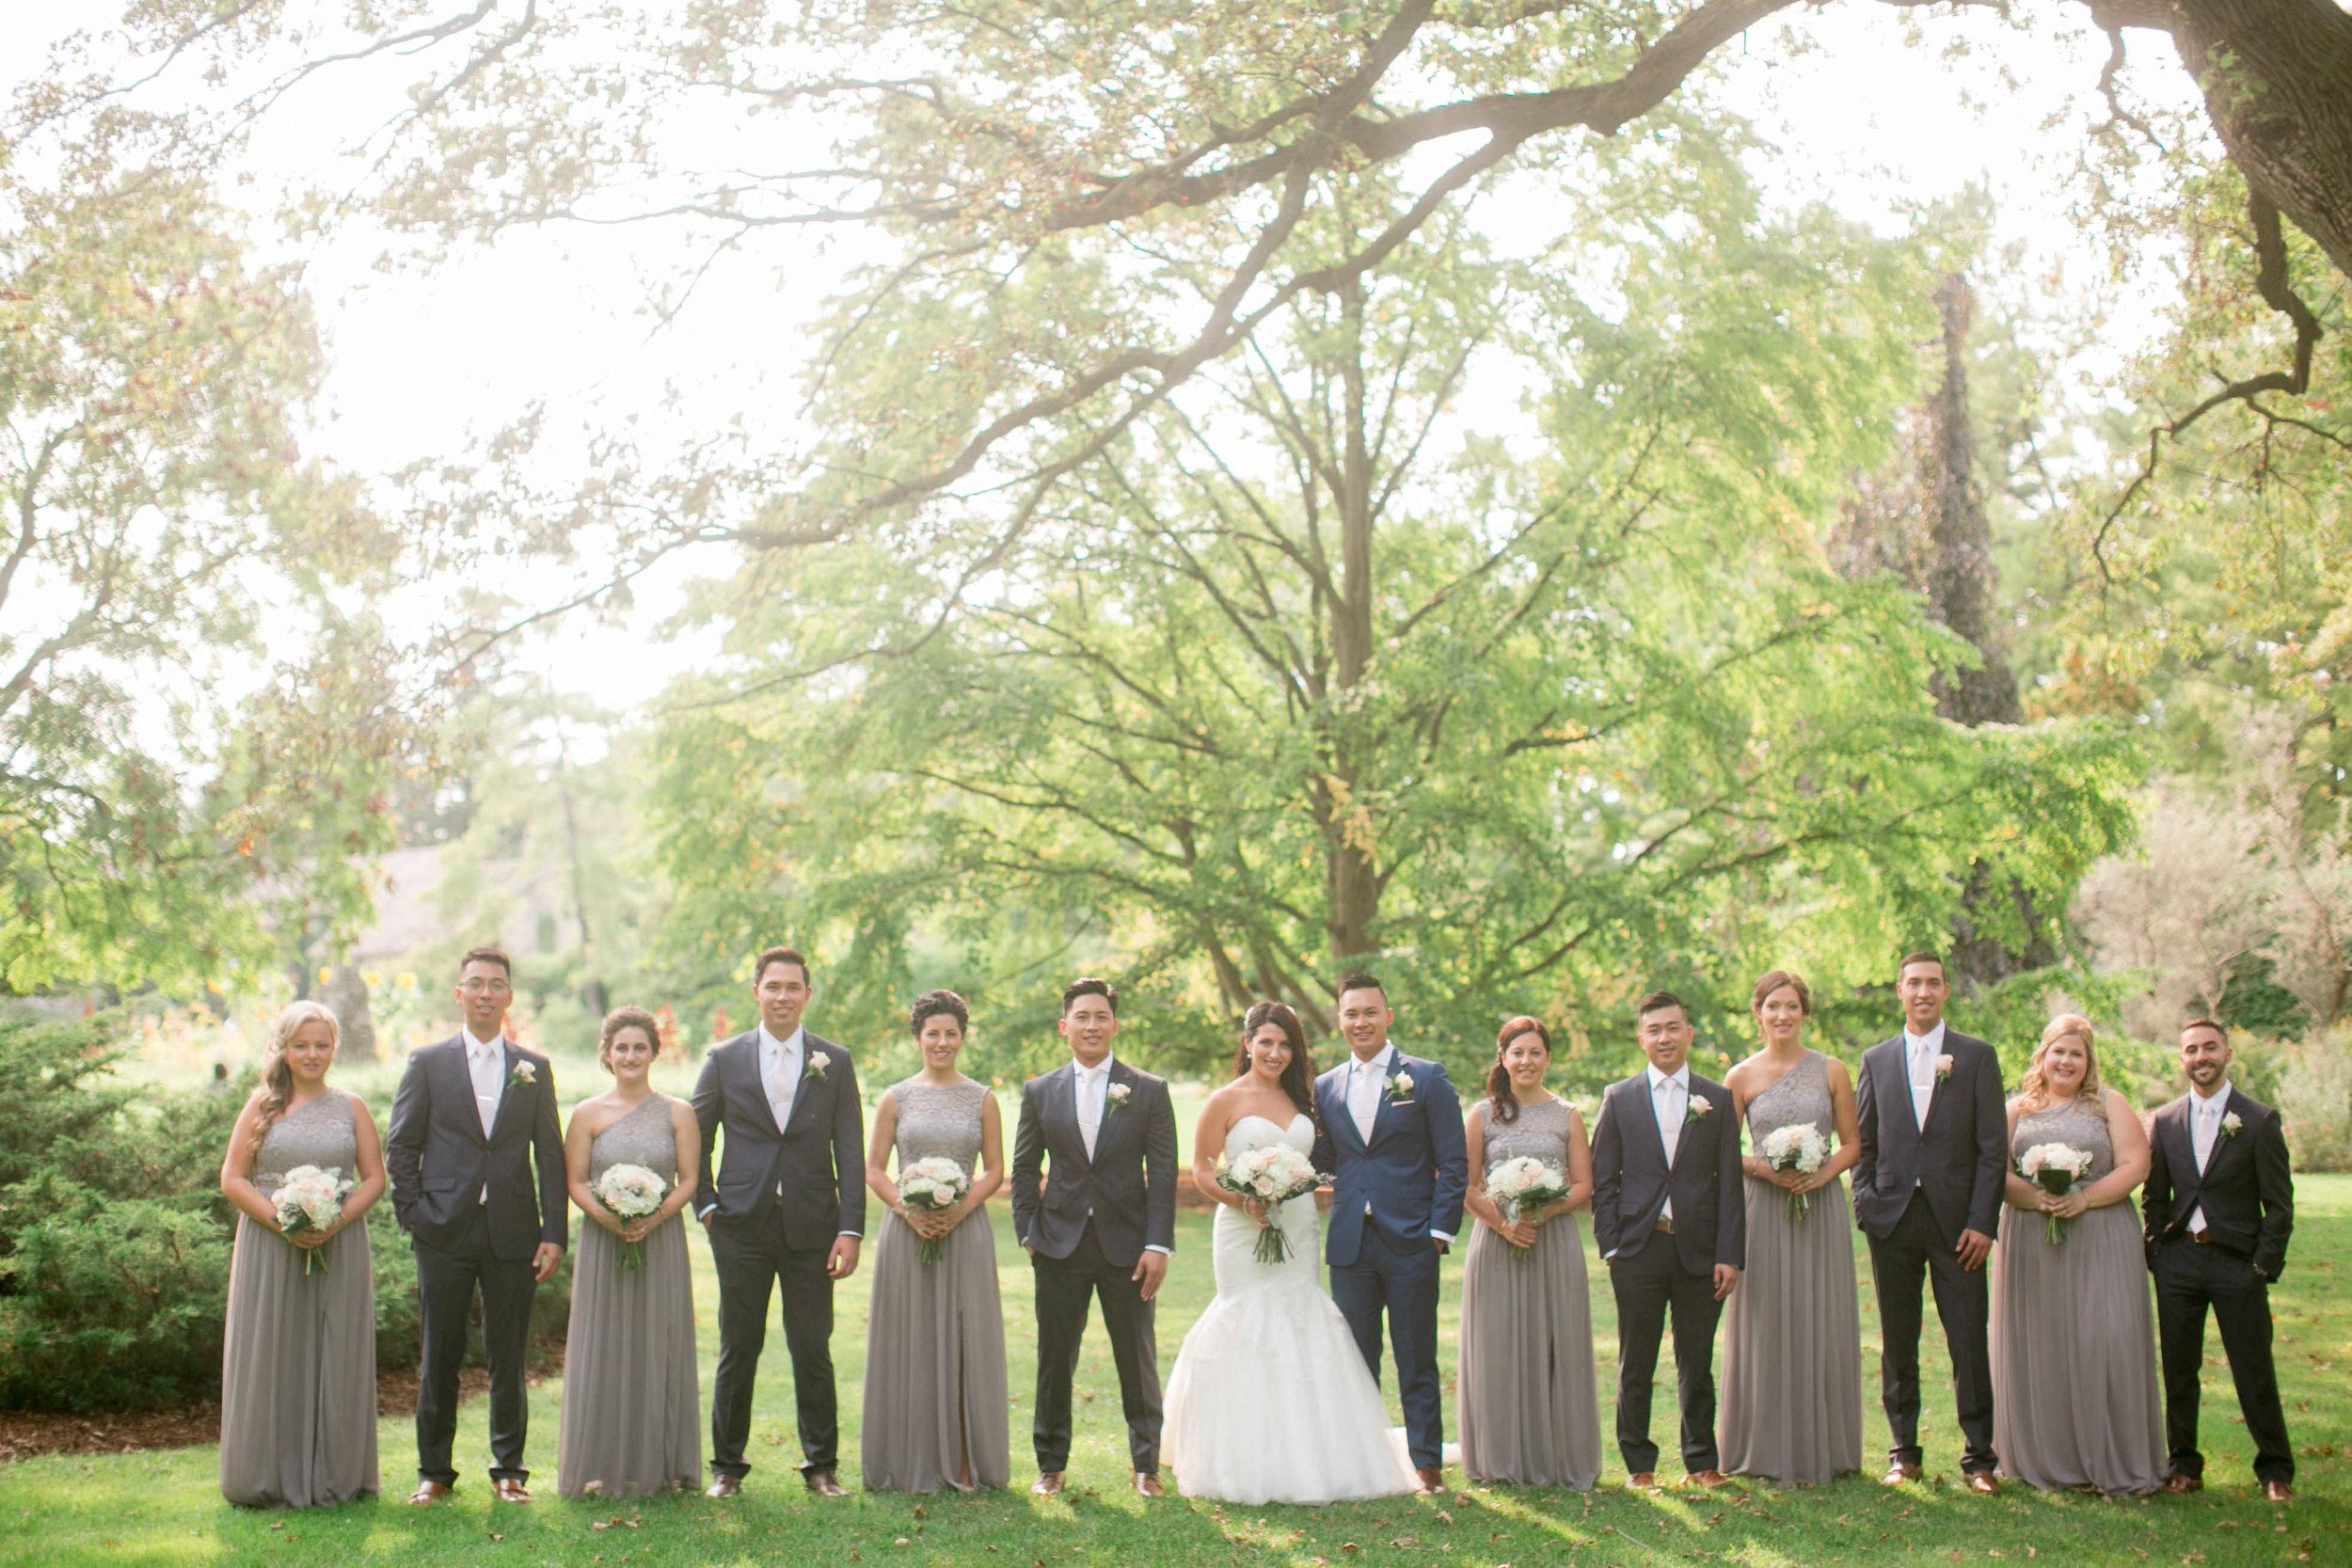 Stefanie___Bernard___Daniel_Ricci_Weddings_High_Res._Finals__292.jpg